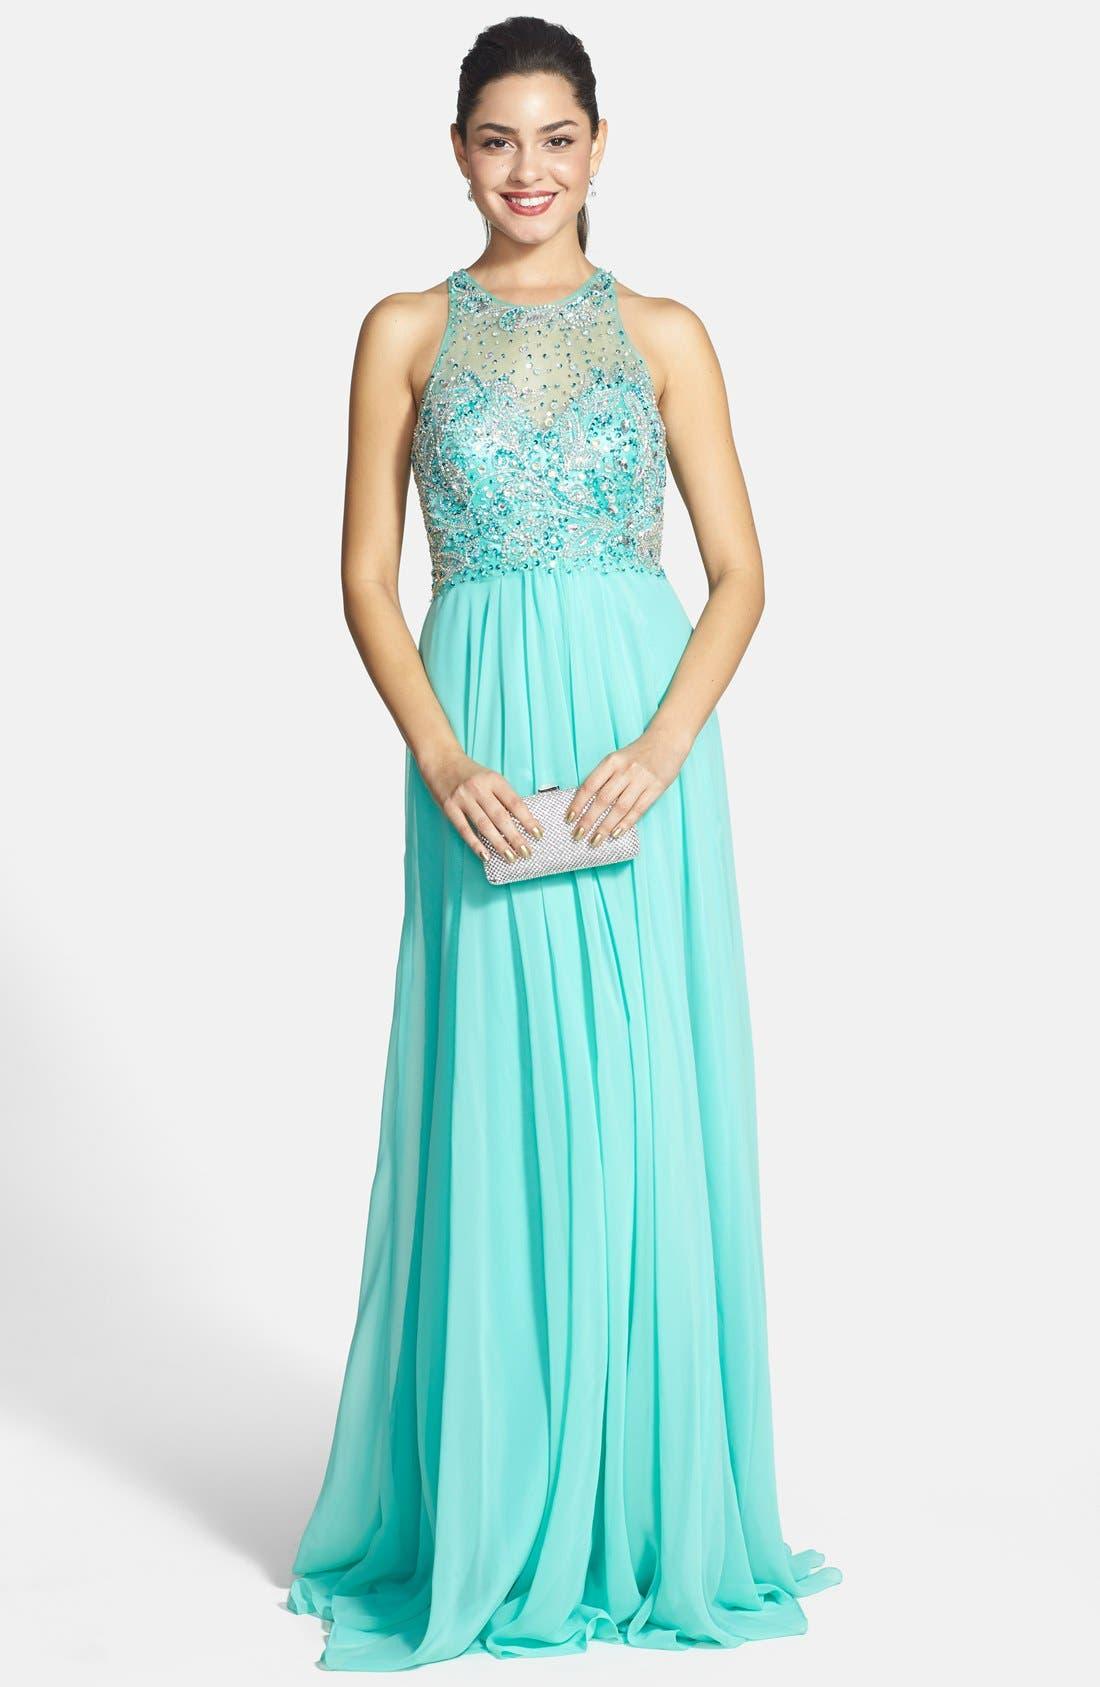 Main Image - Faviana Embellished Chiffon Gown